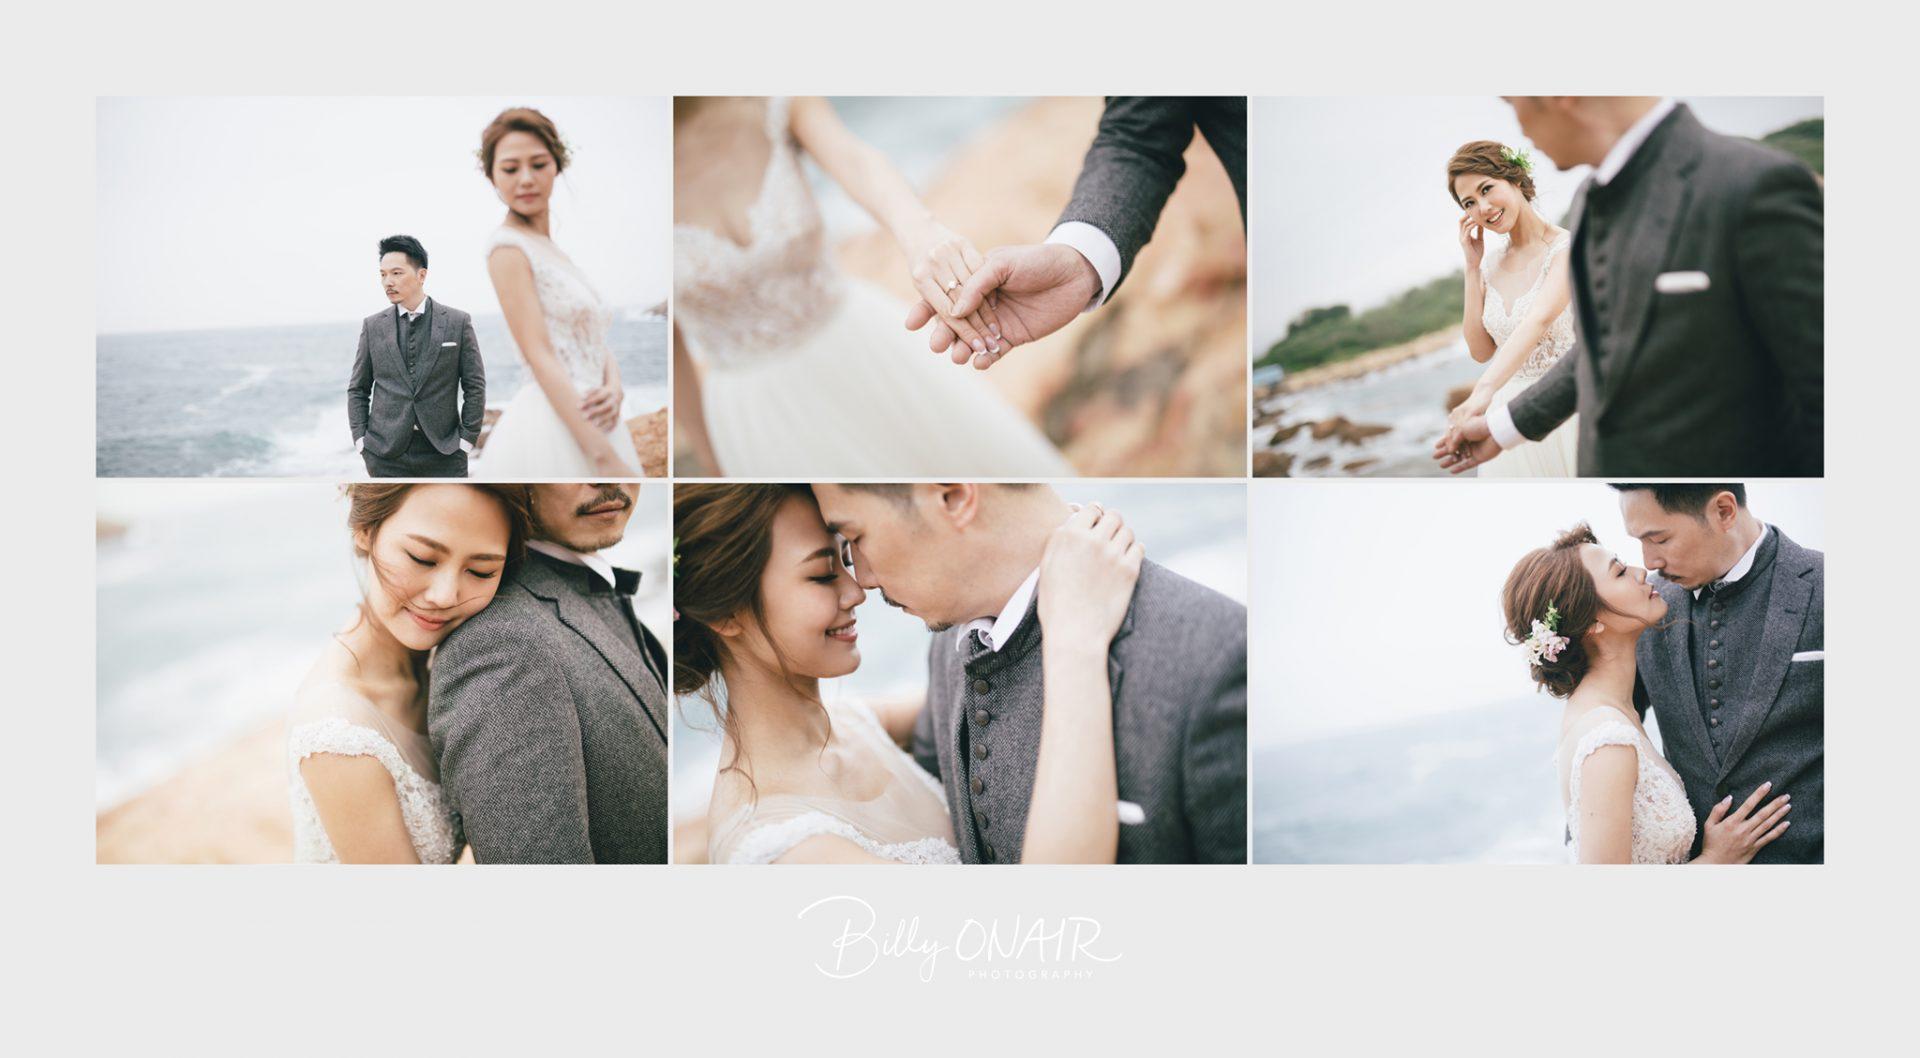 hk_pre_wedding_16